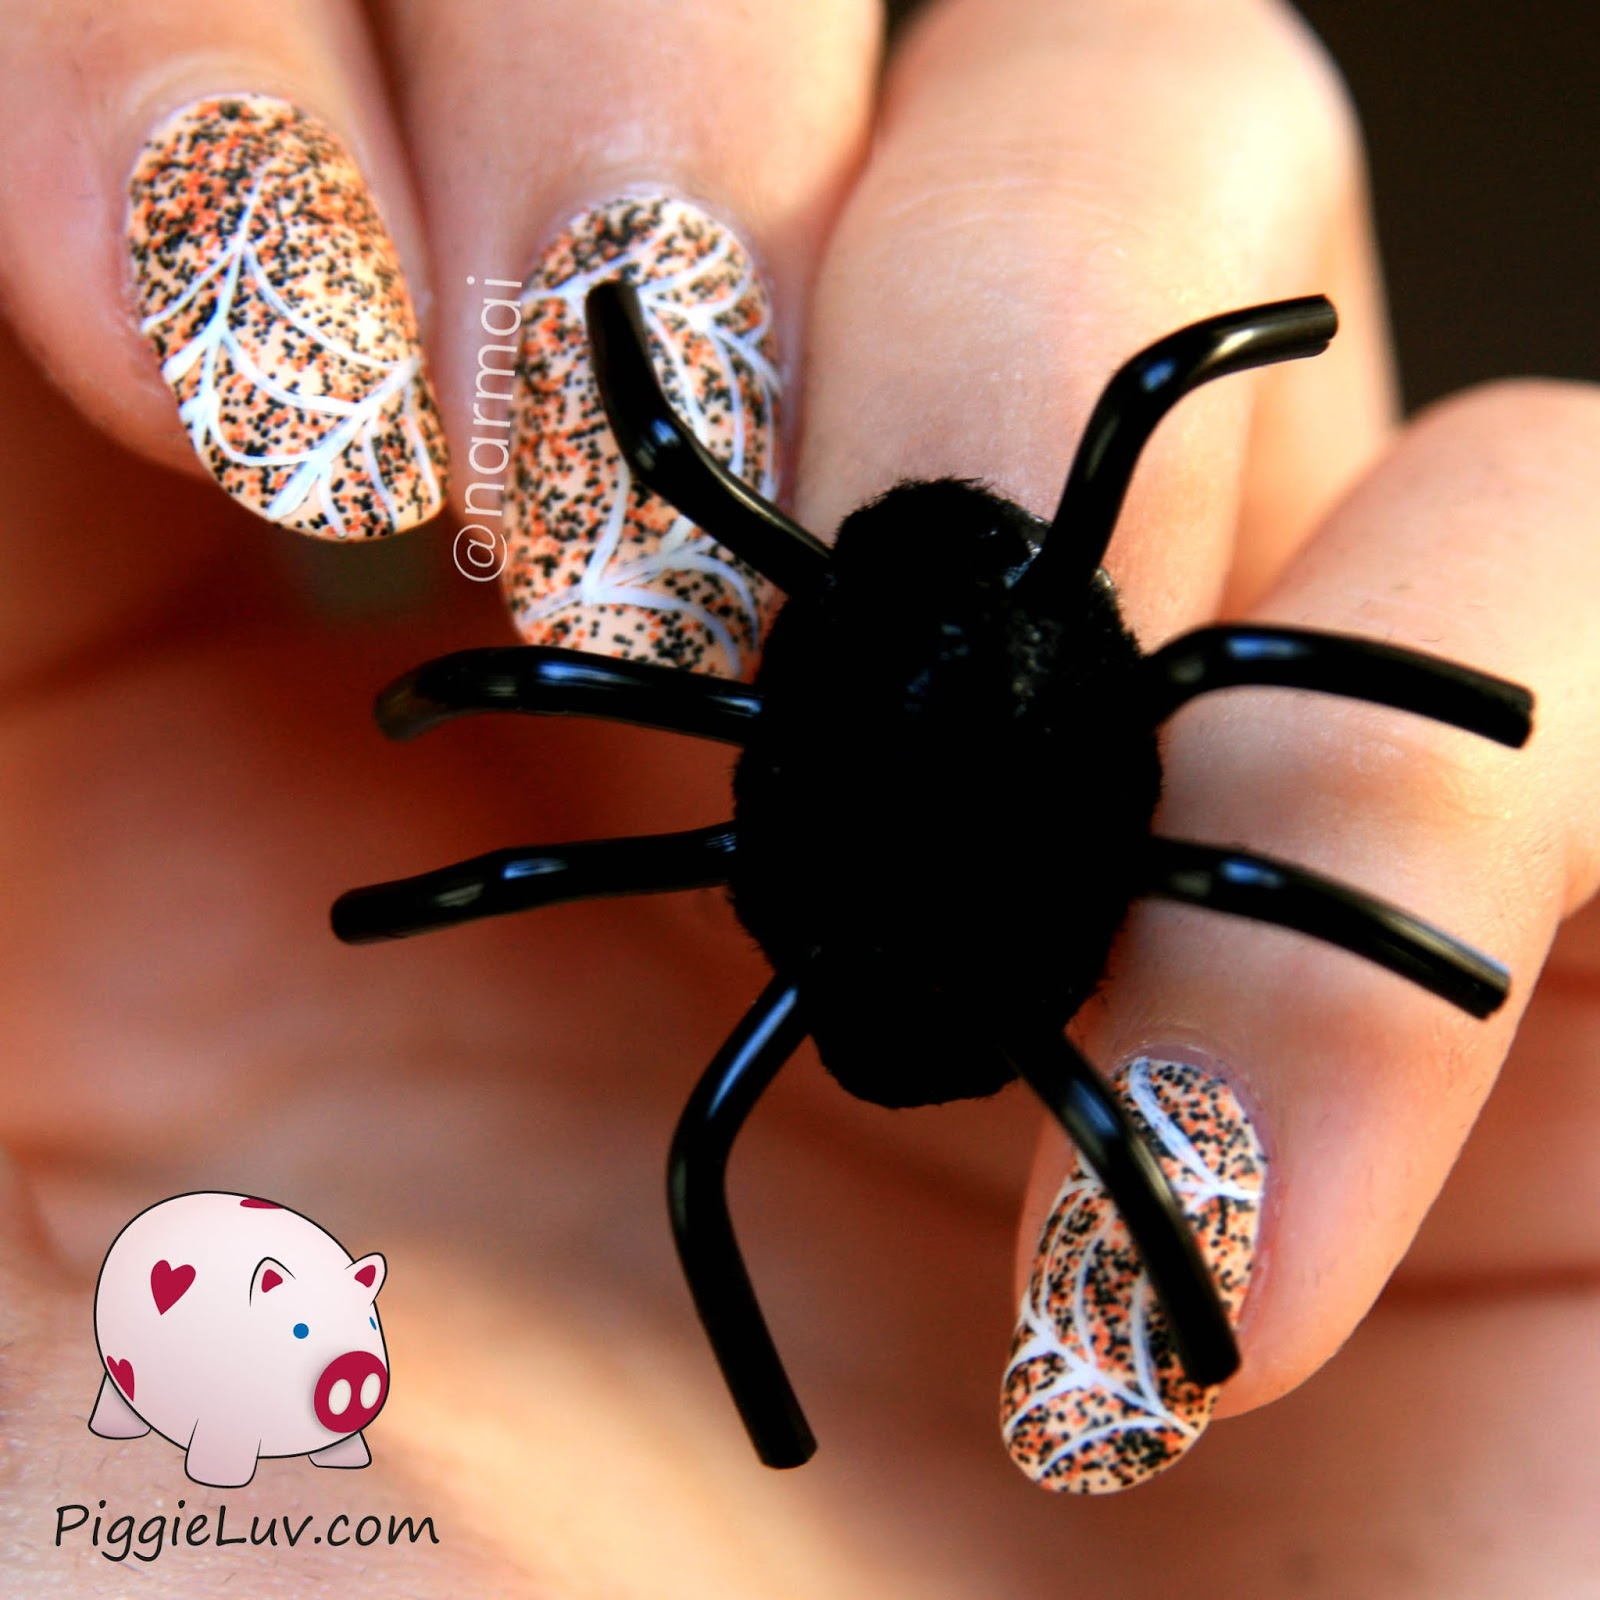 PiggieLuv: Creepy crawly 3D spider nail art